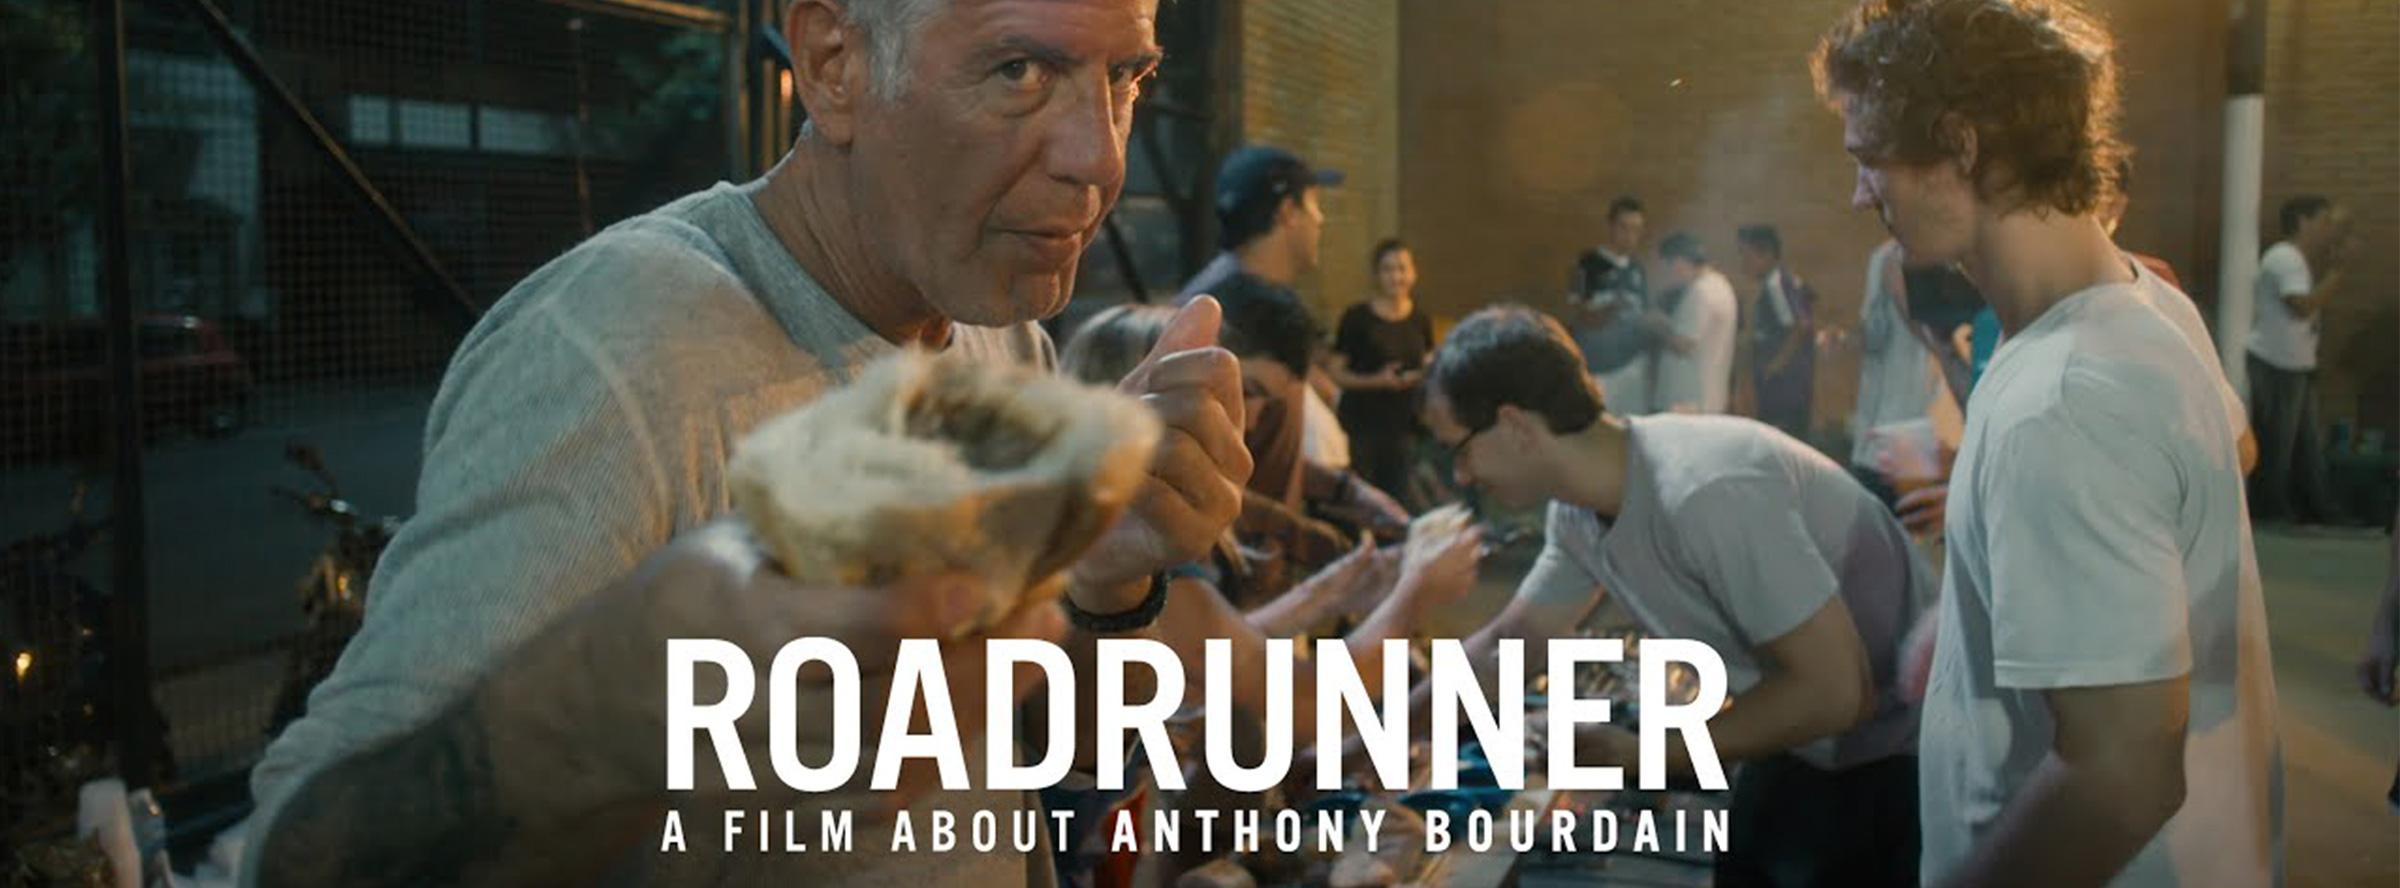 Slider Image for Roadrunner: A Film About Anthony Bourdain